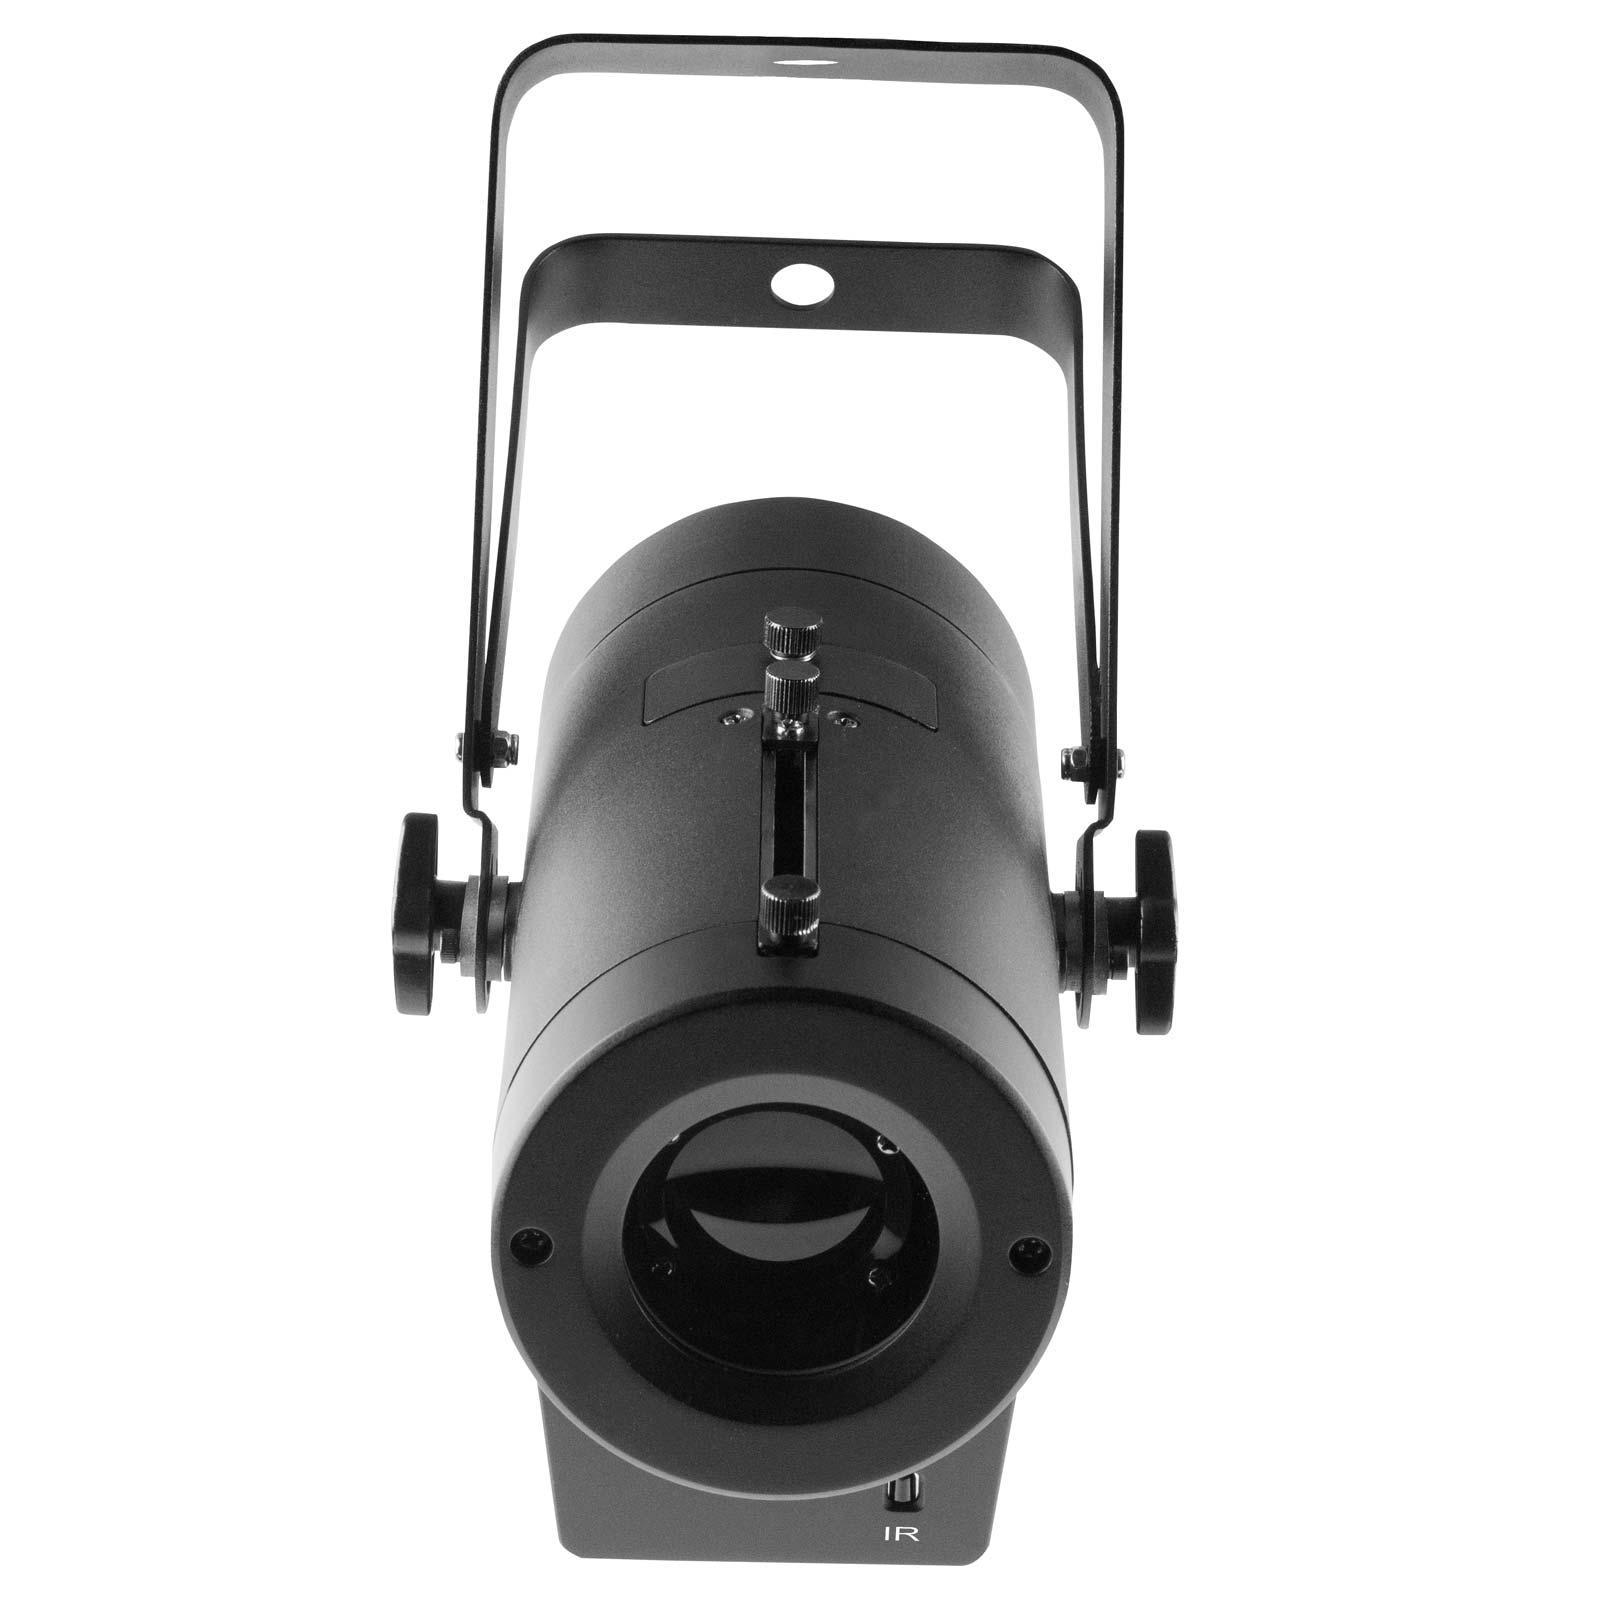 chauvet dj gobo zoom usb compact wireless dmx led gobo projector agiprodj. Black Bedroom Furniture Sets. Home Design Ideas